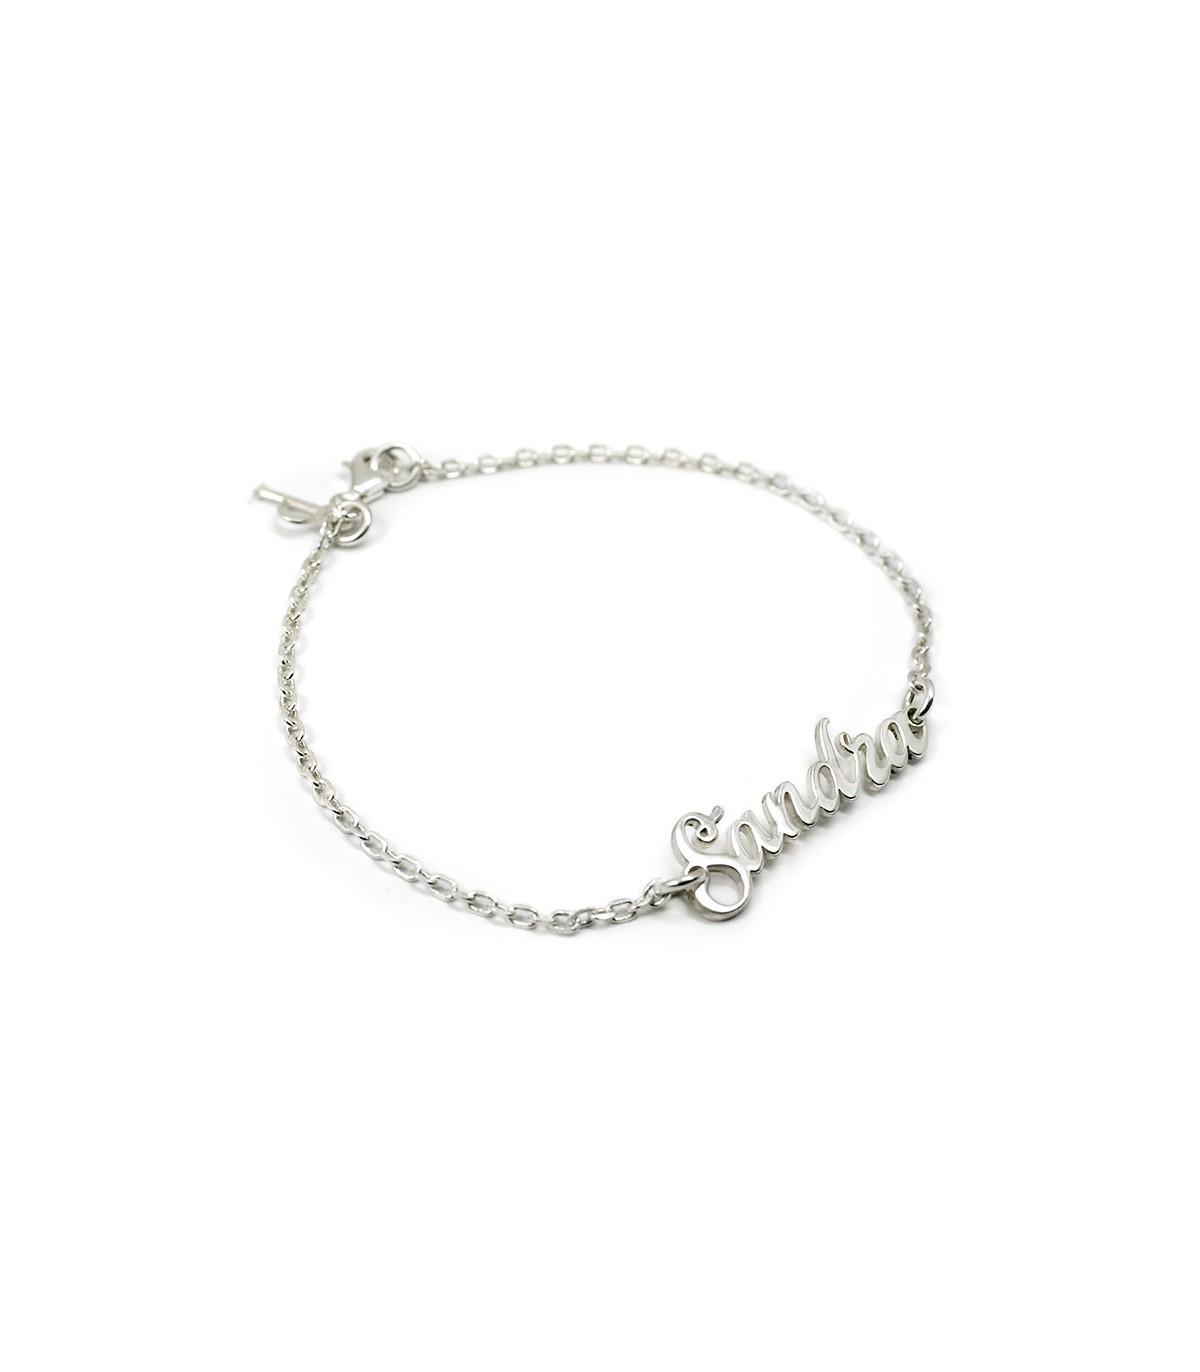 253a151e109a Pulsera de plata personalizada con nombre. Joyas para mujer